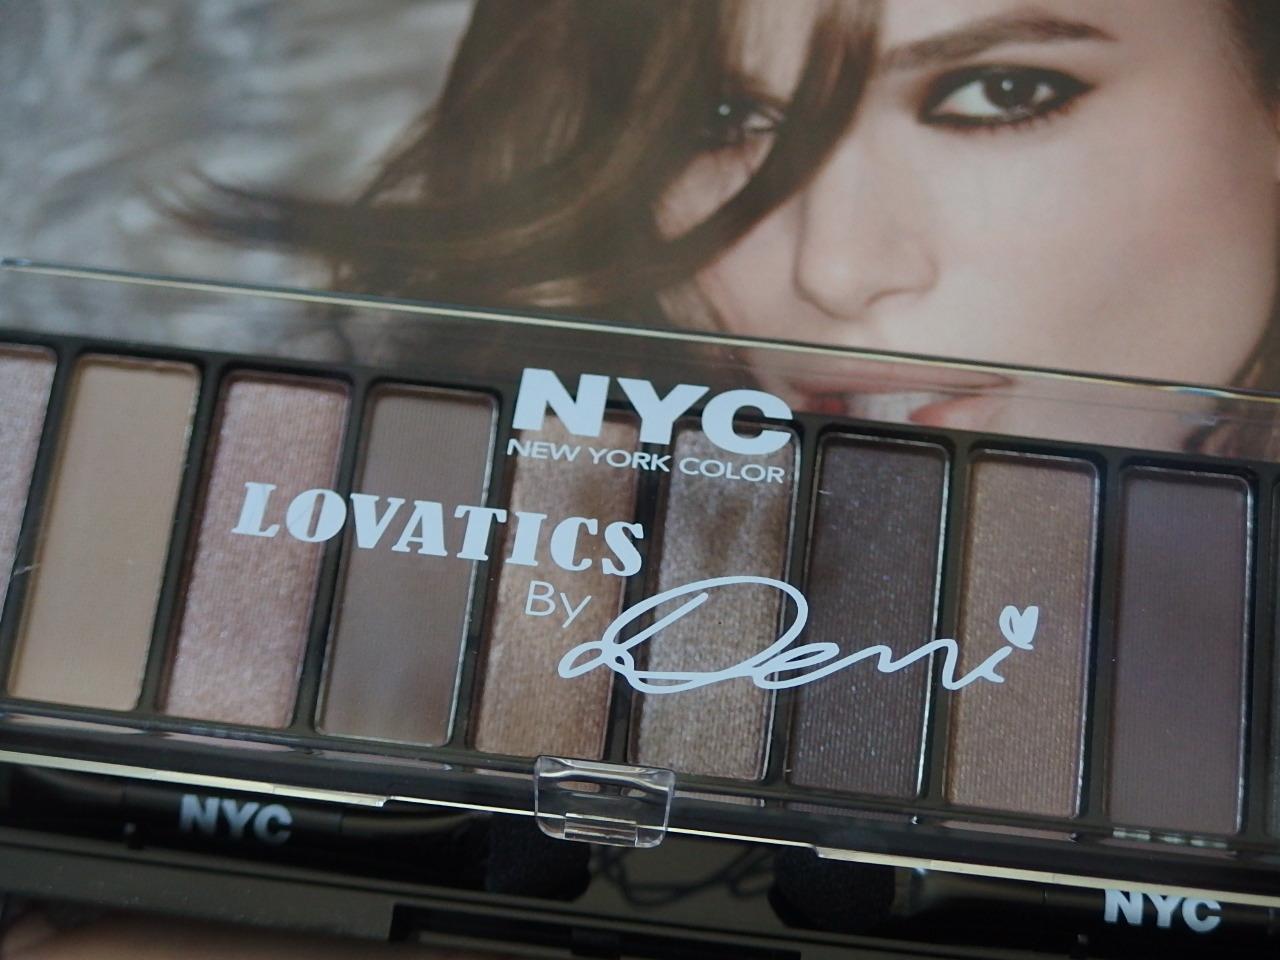 NYC Lovtics Demi Eyeshadow Palette